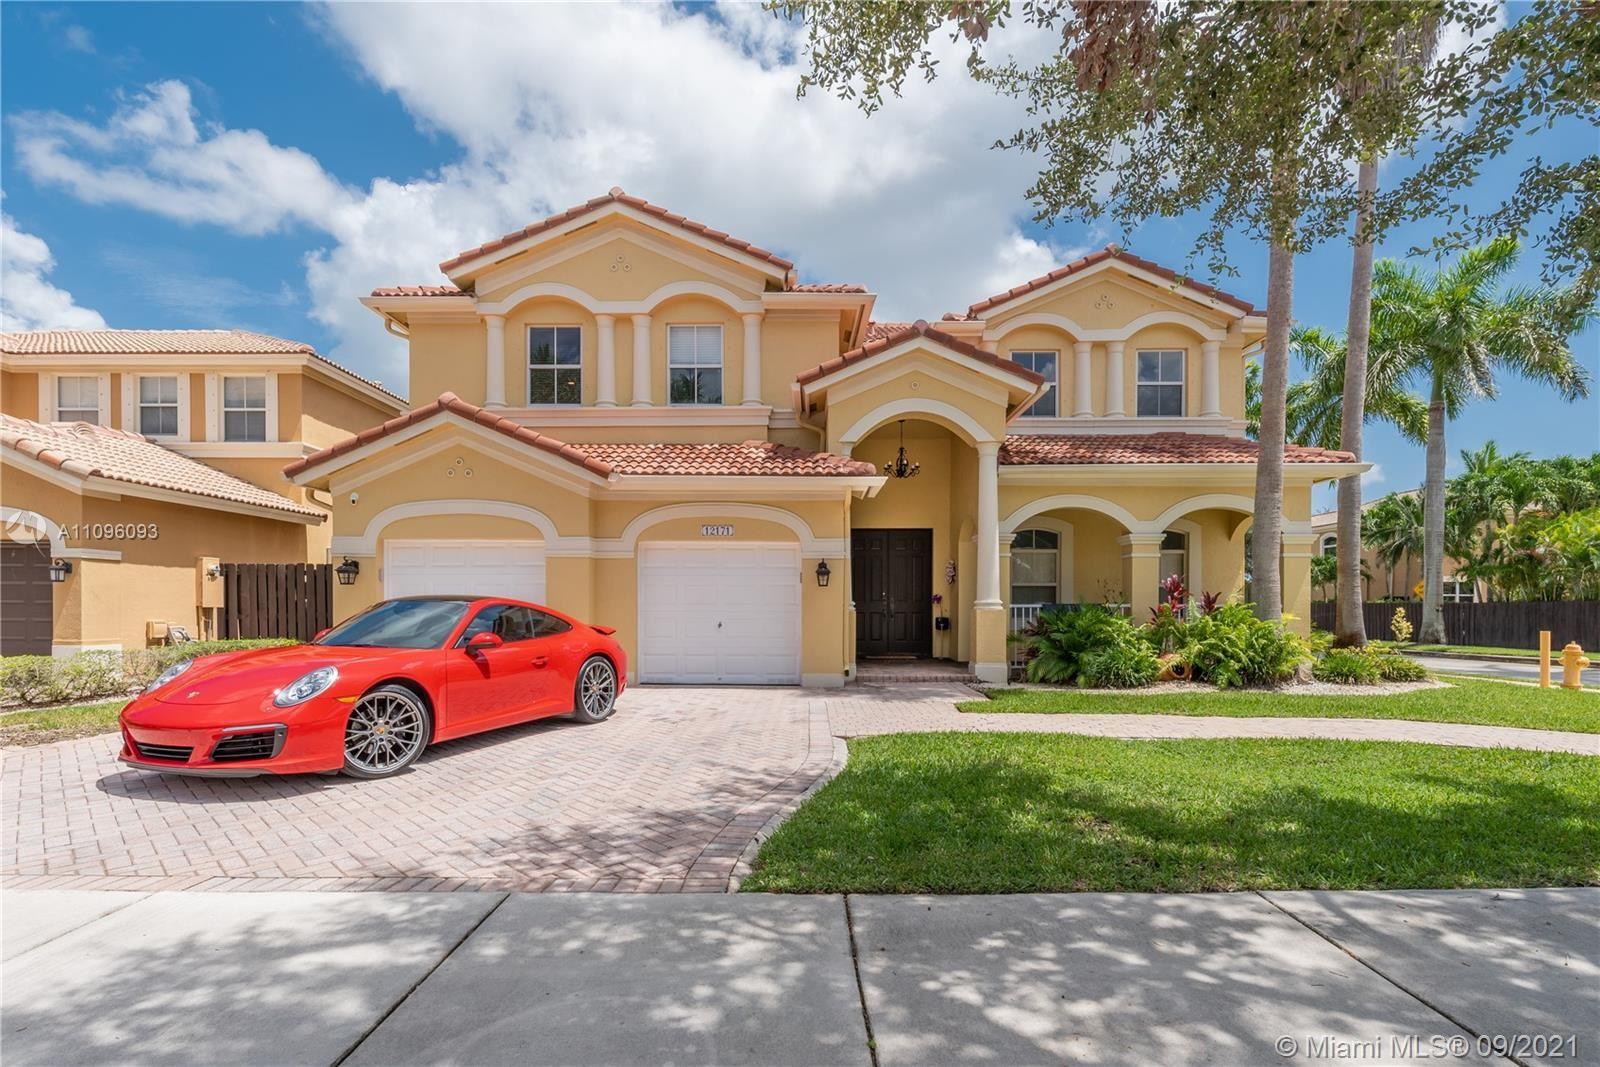 12171 SW 122nd Path, Miami, FL 33186 - #: A11096093